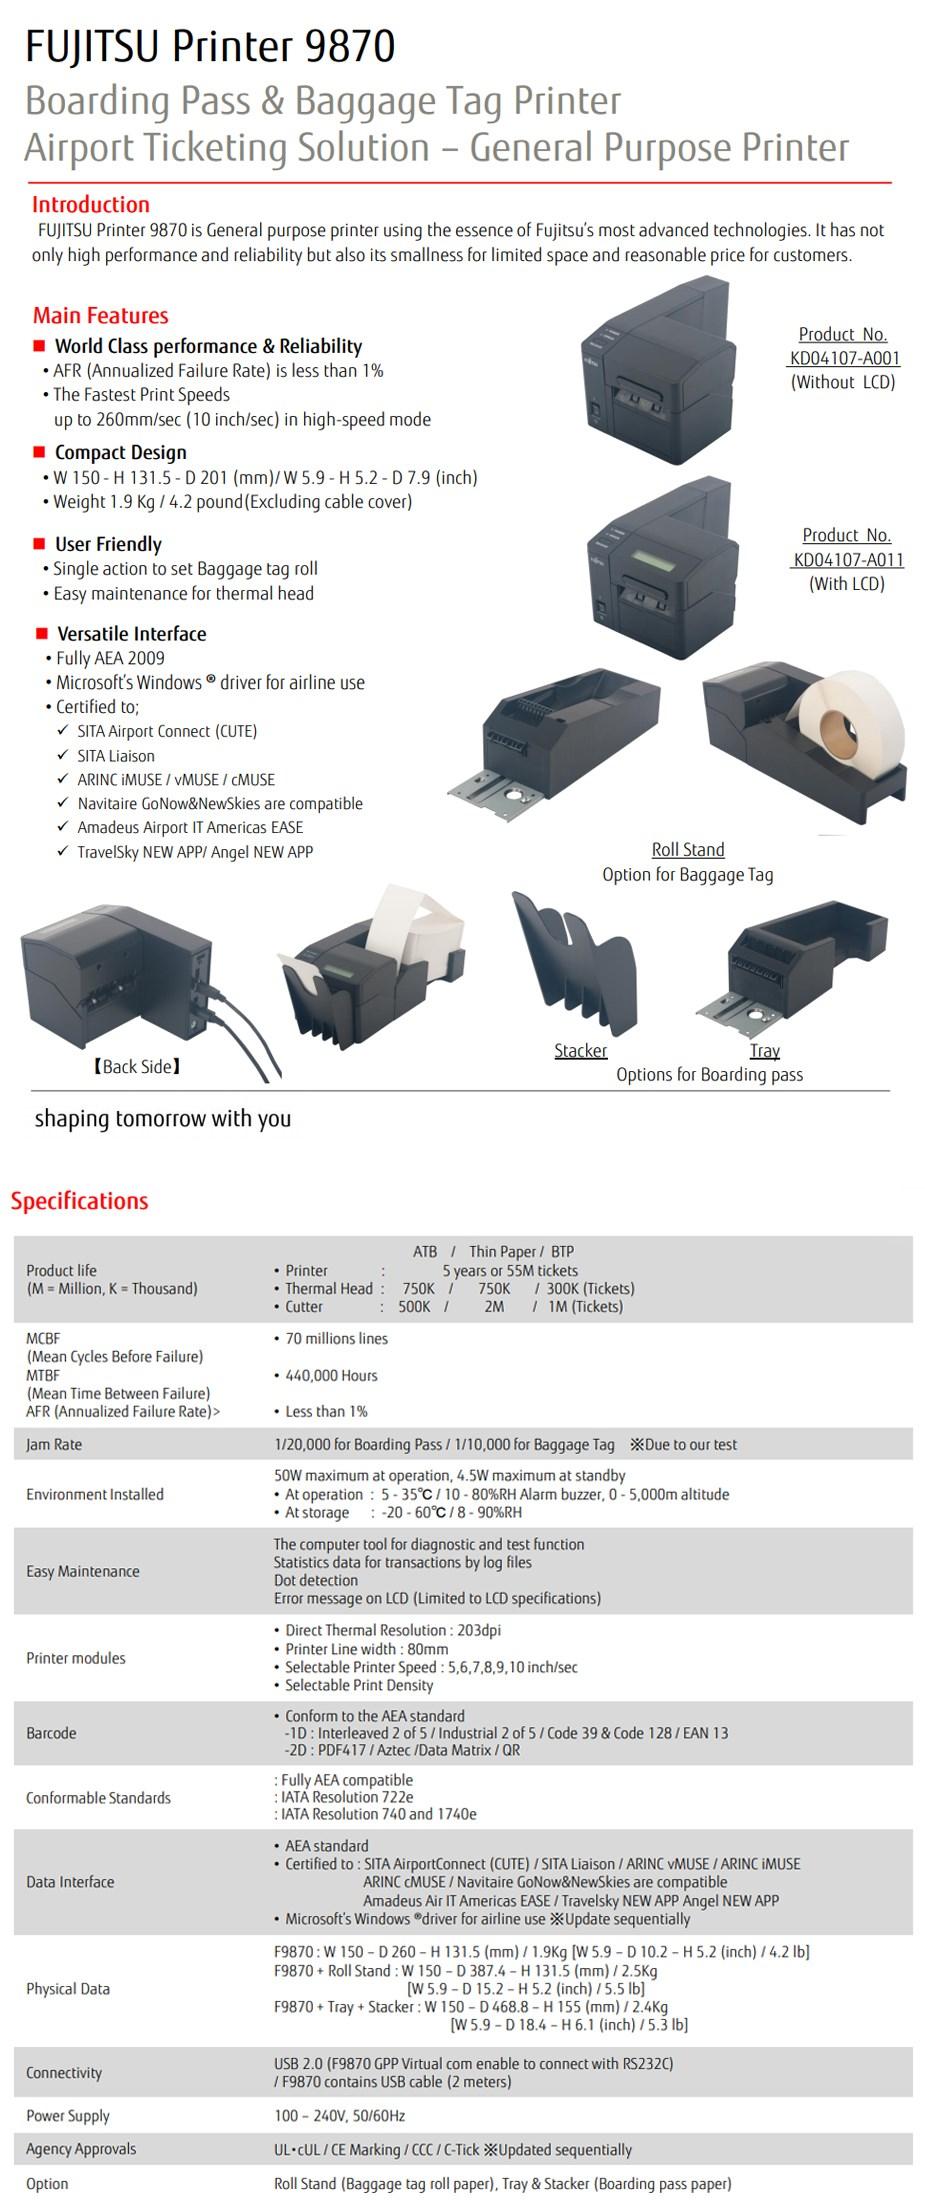 Fujitsu F9870 Compact Boarding Pass & Baggage Tag Printer - Desktop Overview 1